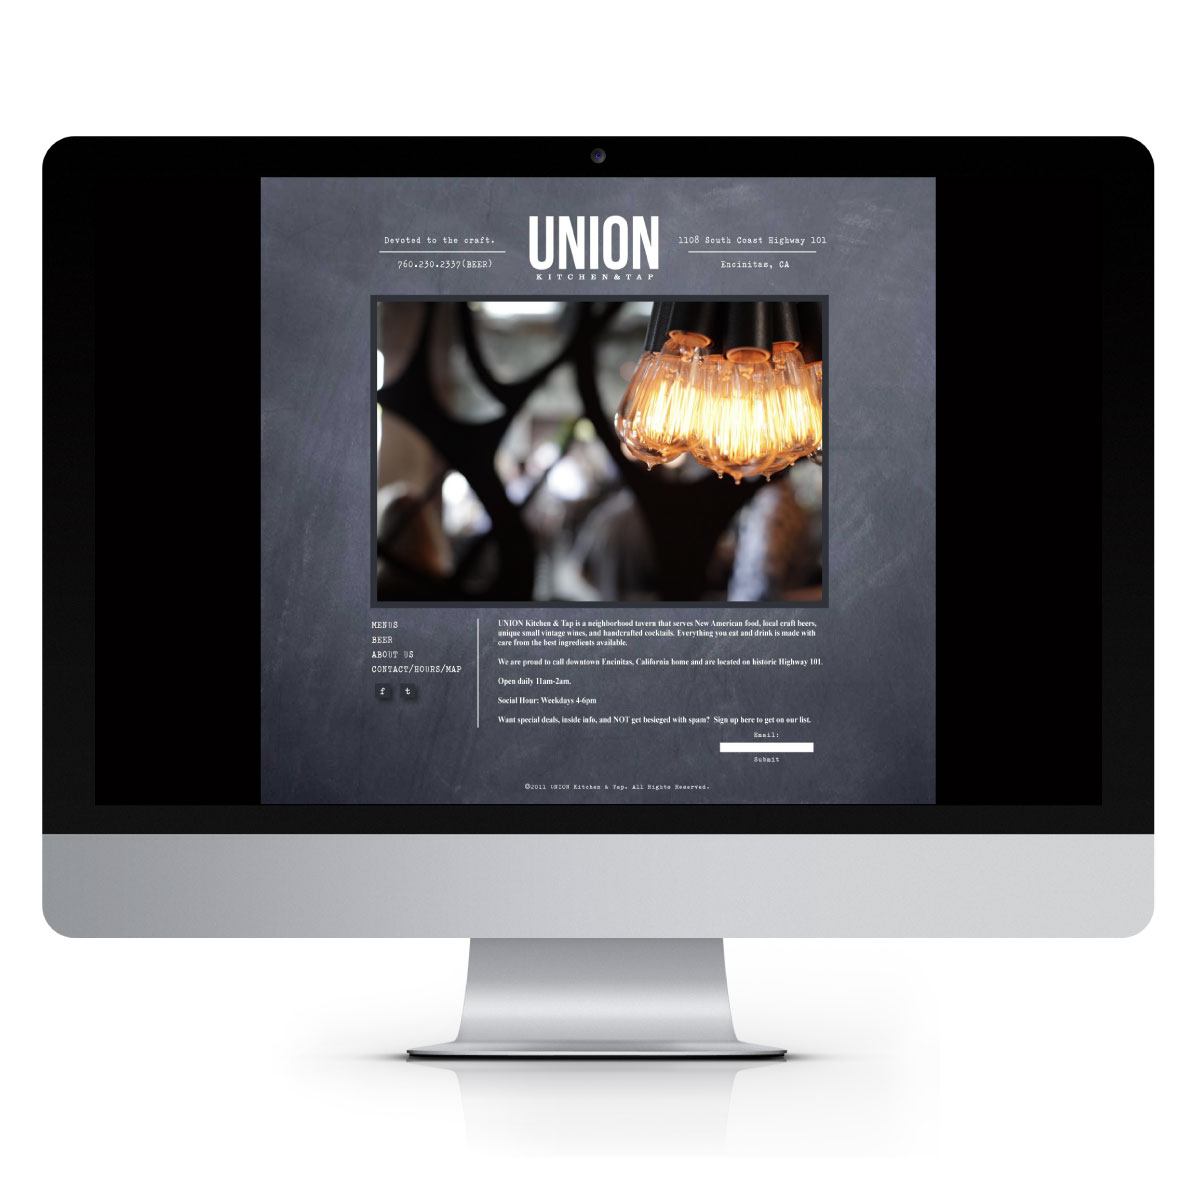 Union_mock.jpg